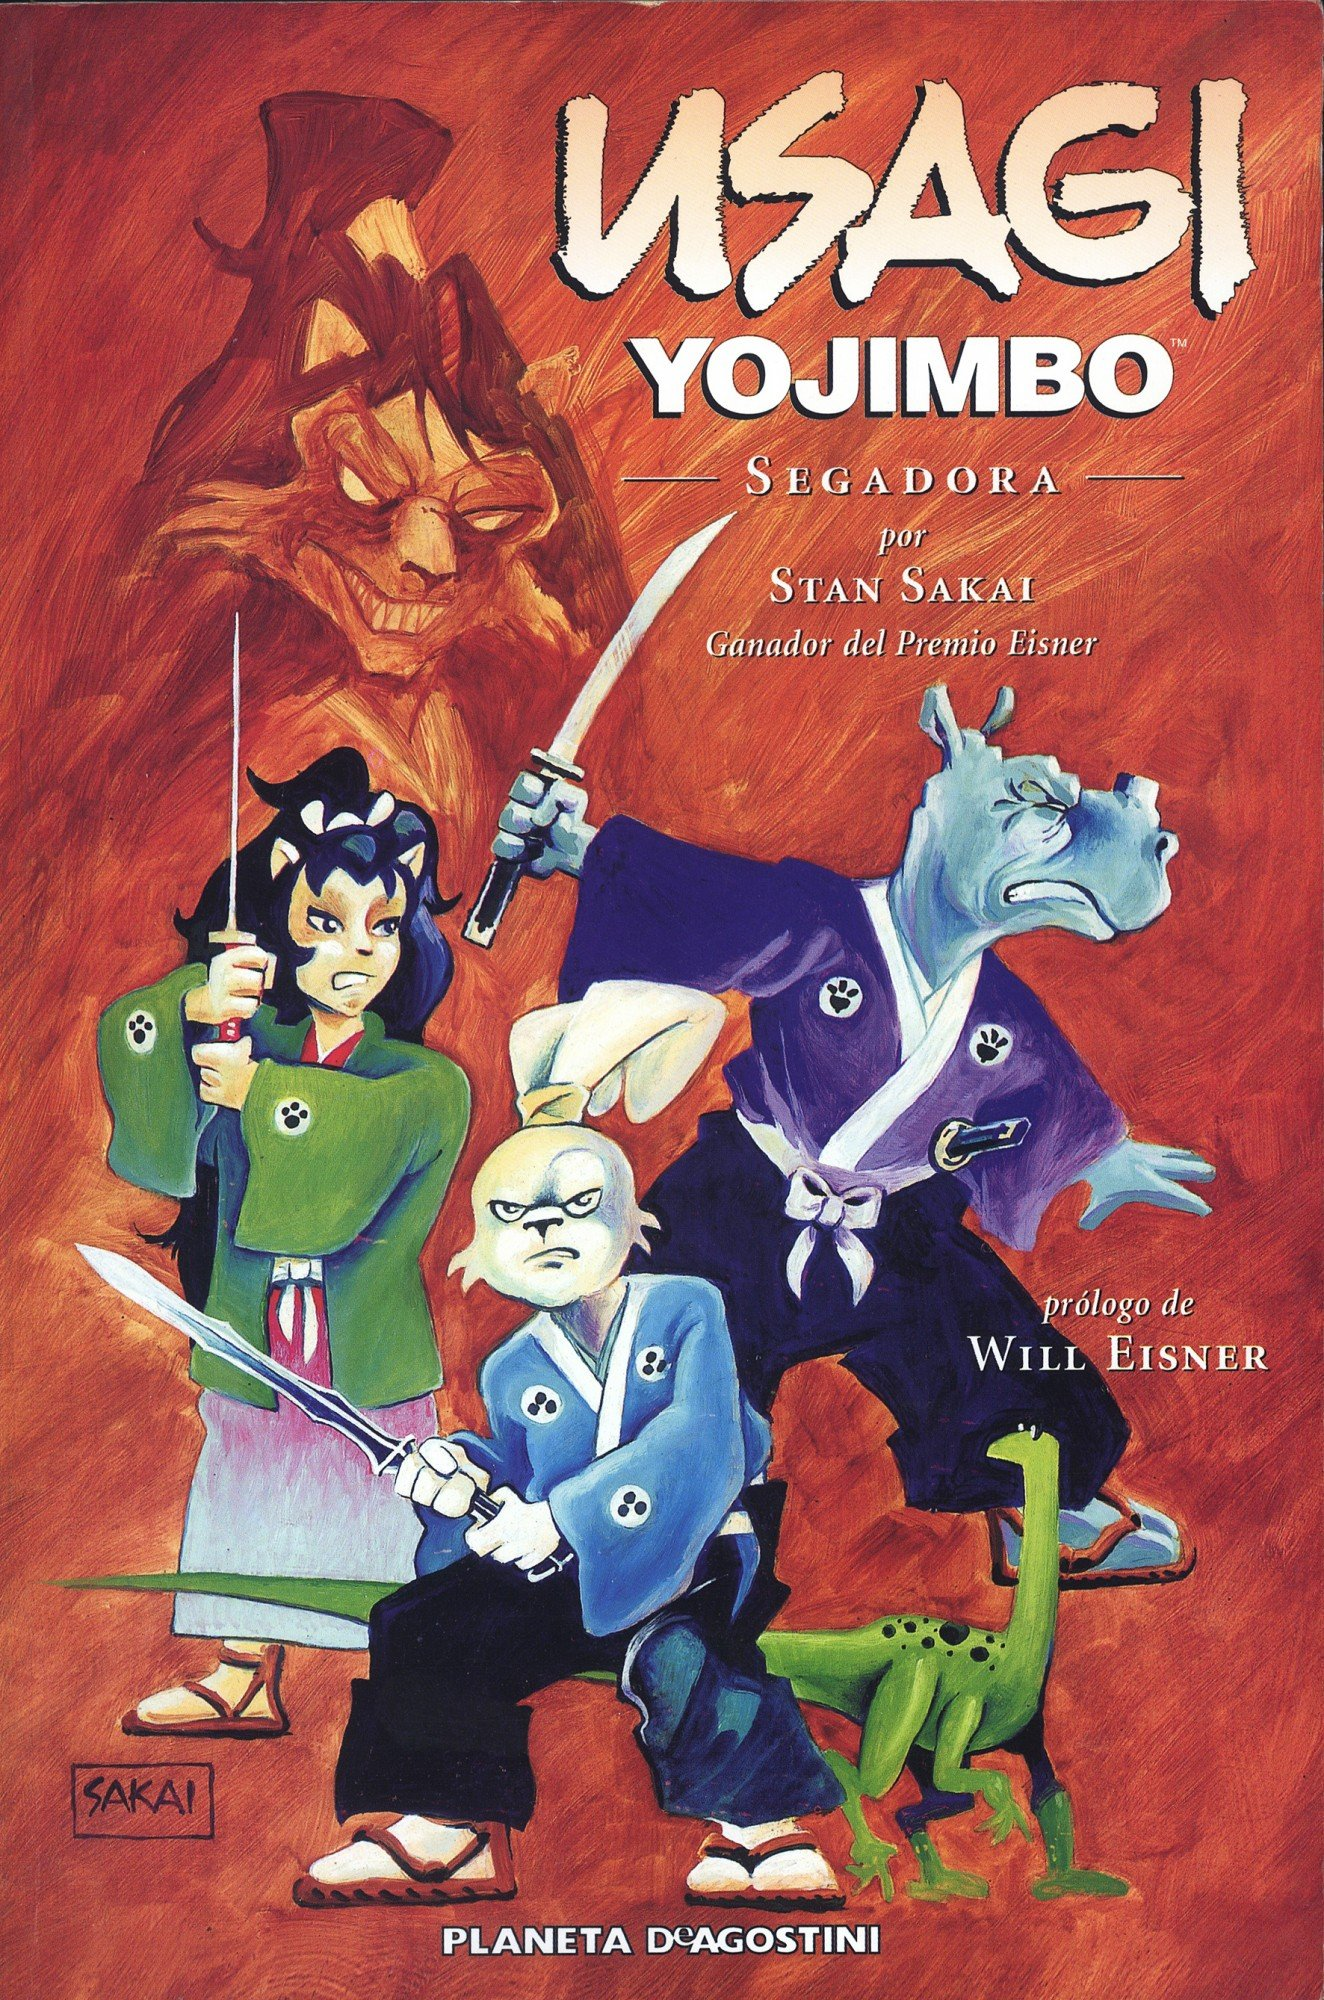 Usagi Yojimbo nº 05: Segadora (Independientes USA): Amazon ...